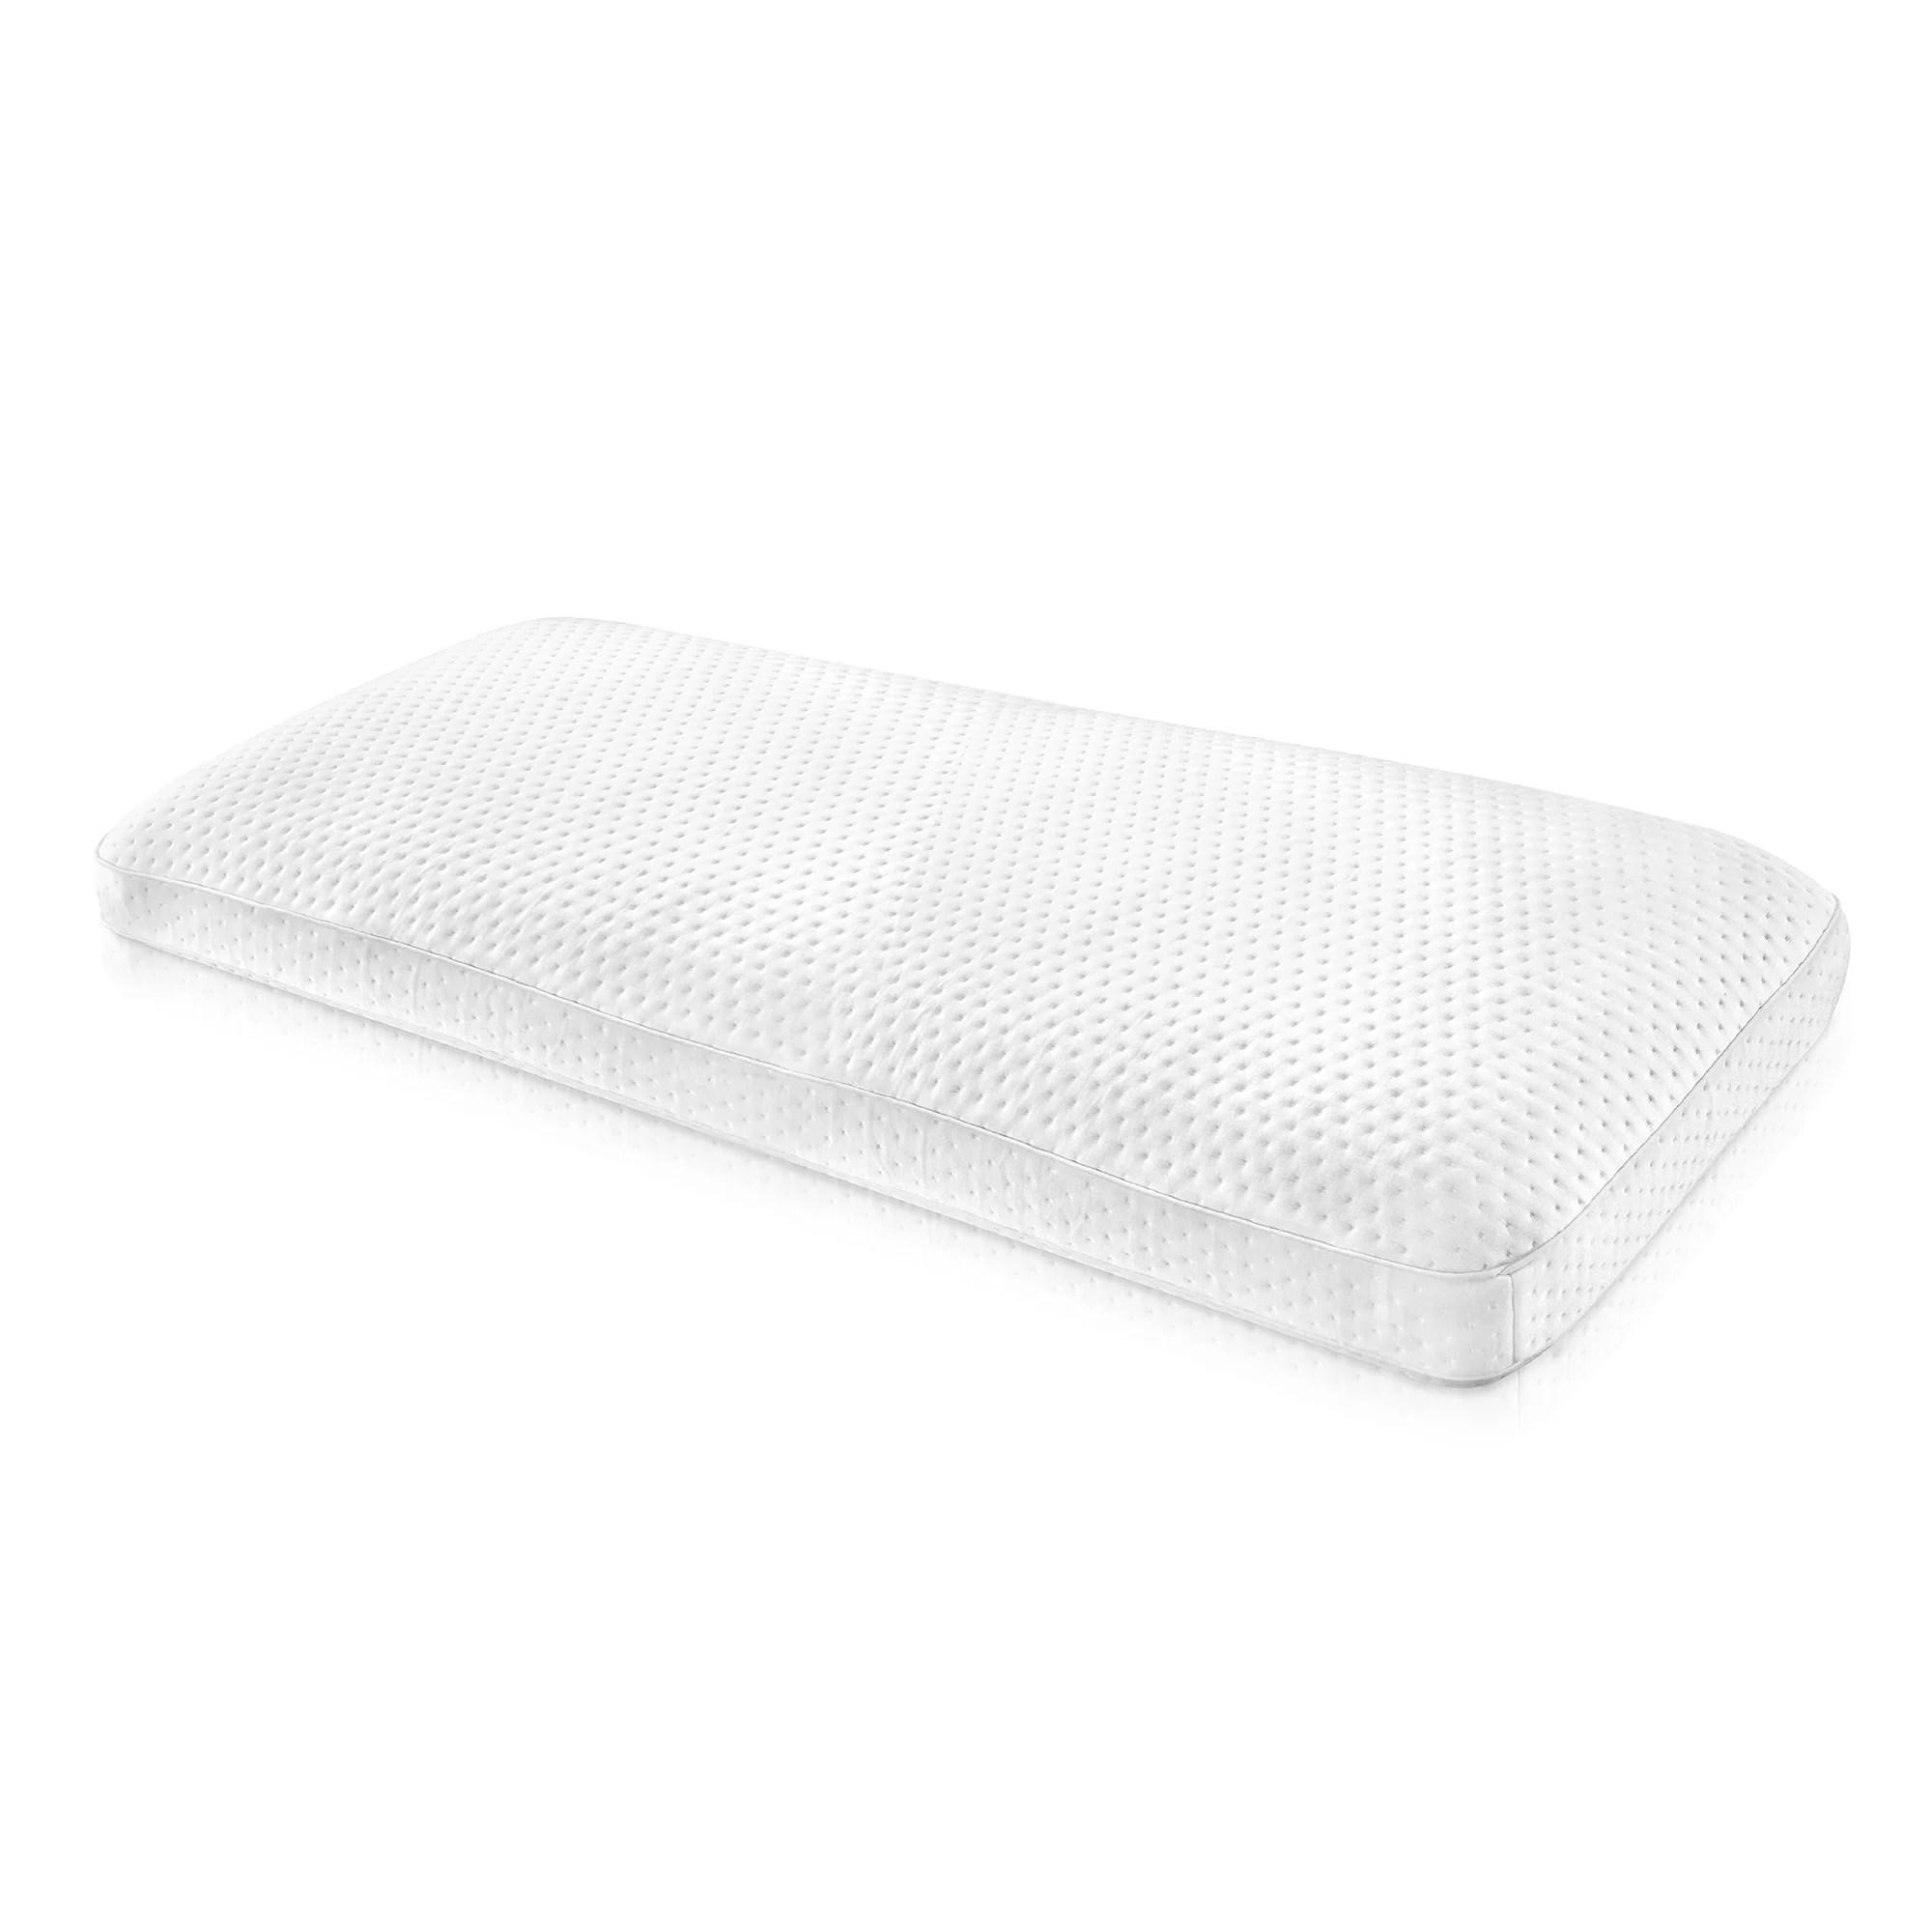 luxury extraordinaire gusseted oversized memory foam medium support pillow